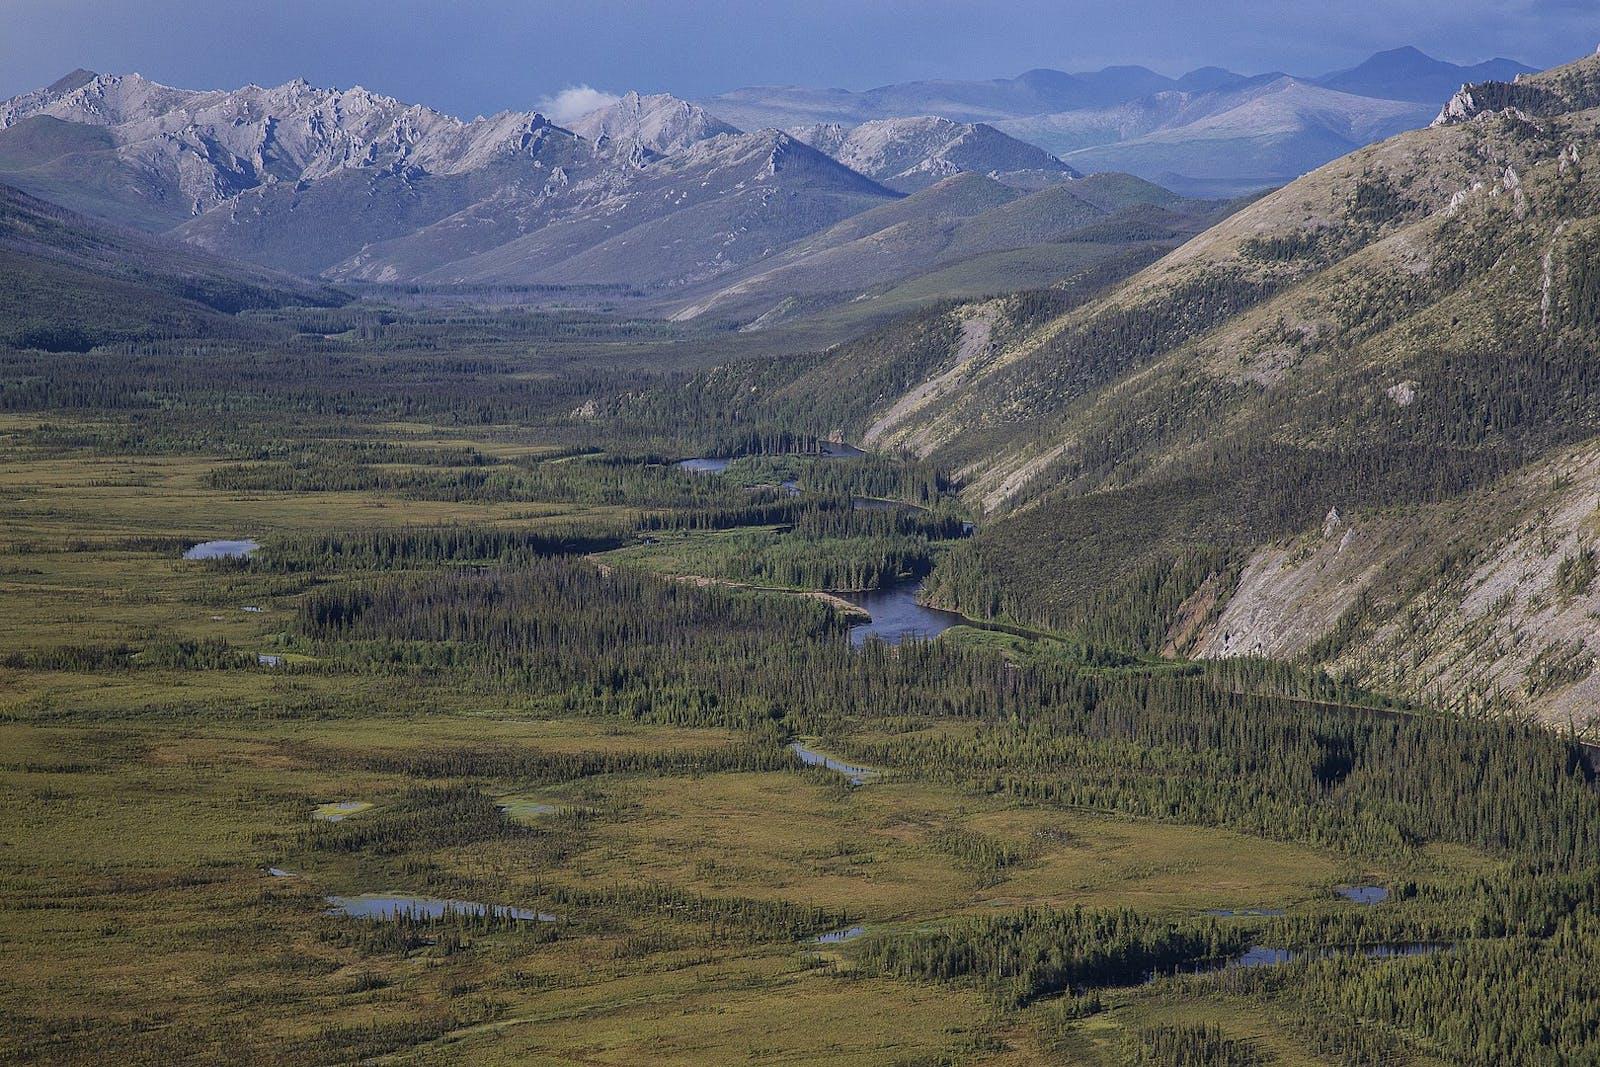 Interior Alaska-Yukon Alpine Tundra